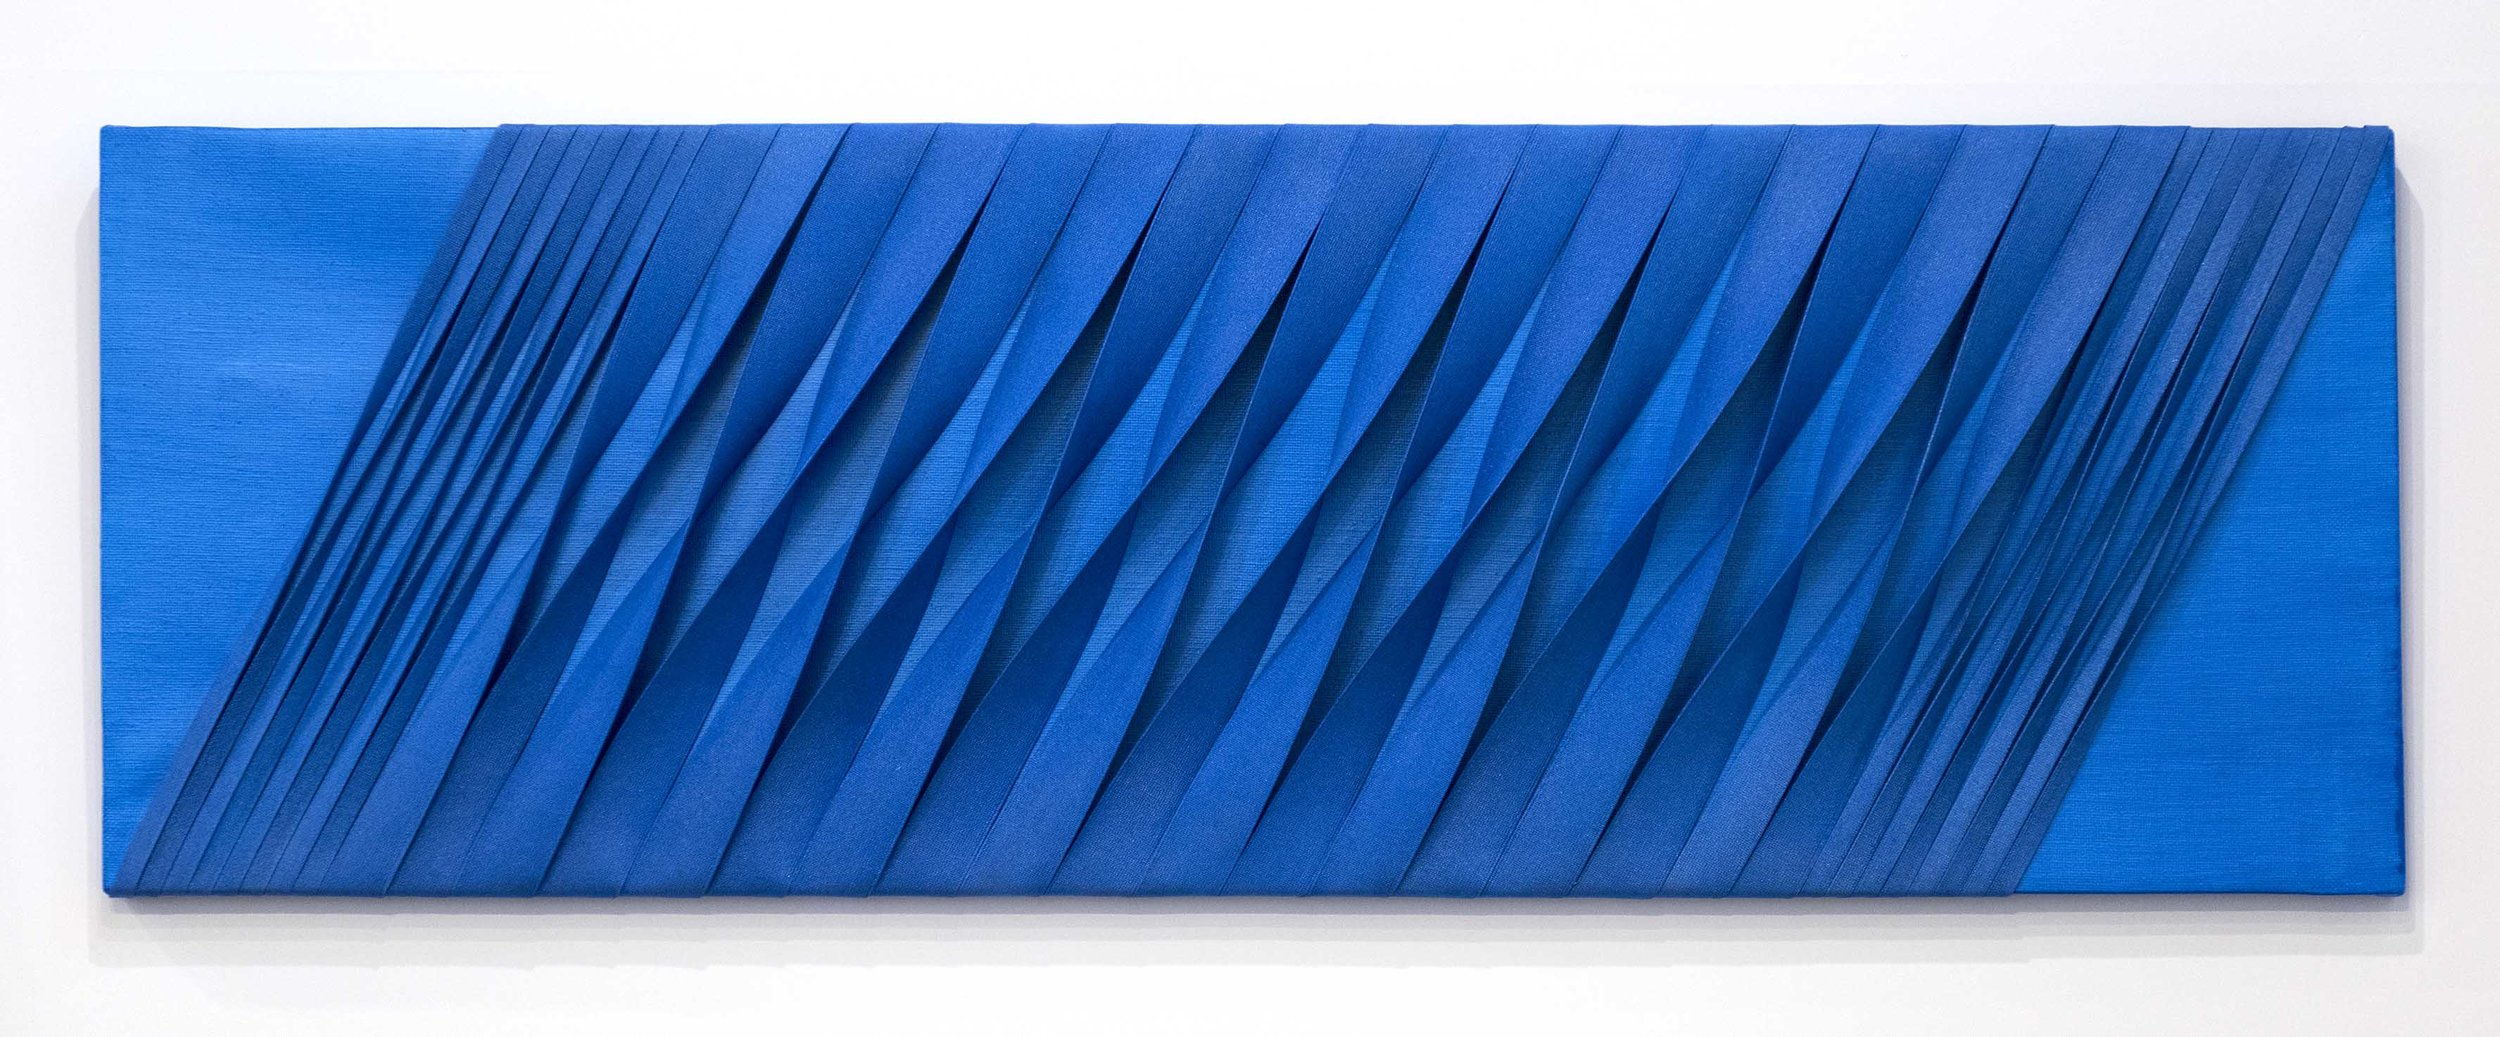 Spazio Estroflesso Blu Cobalto, 2011